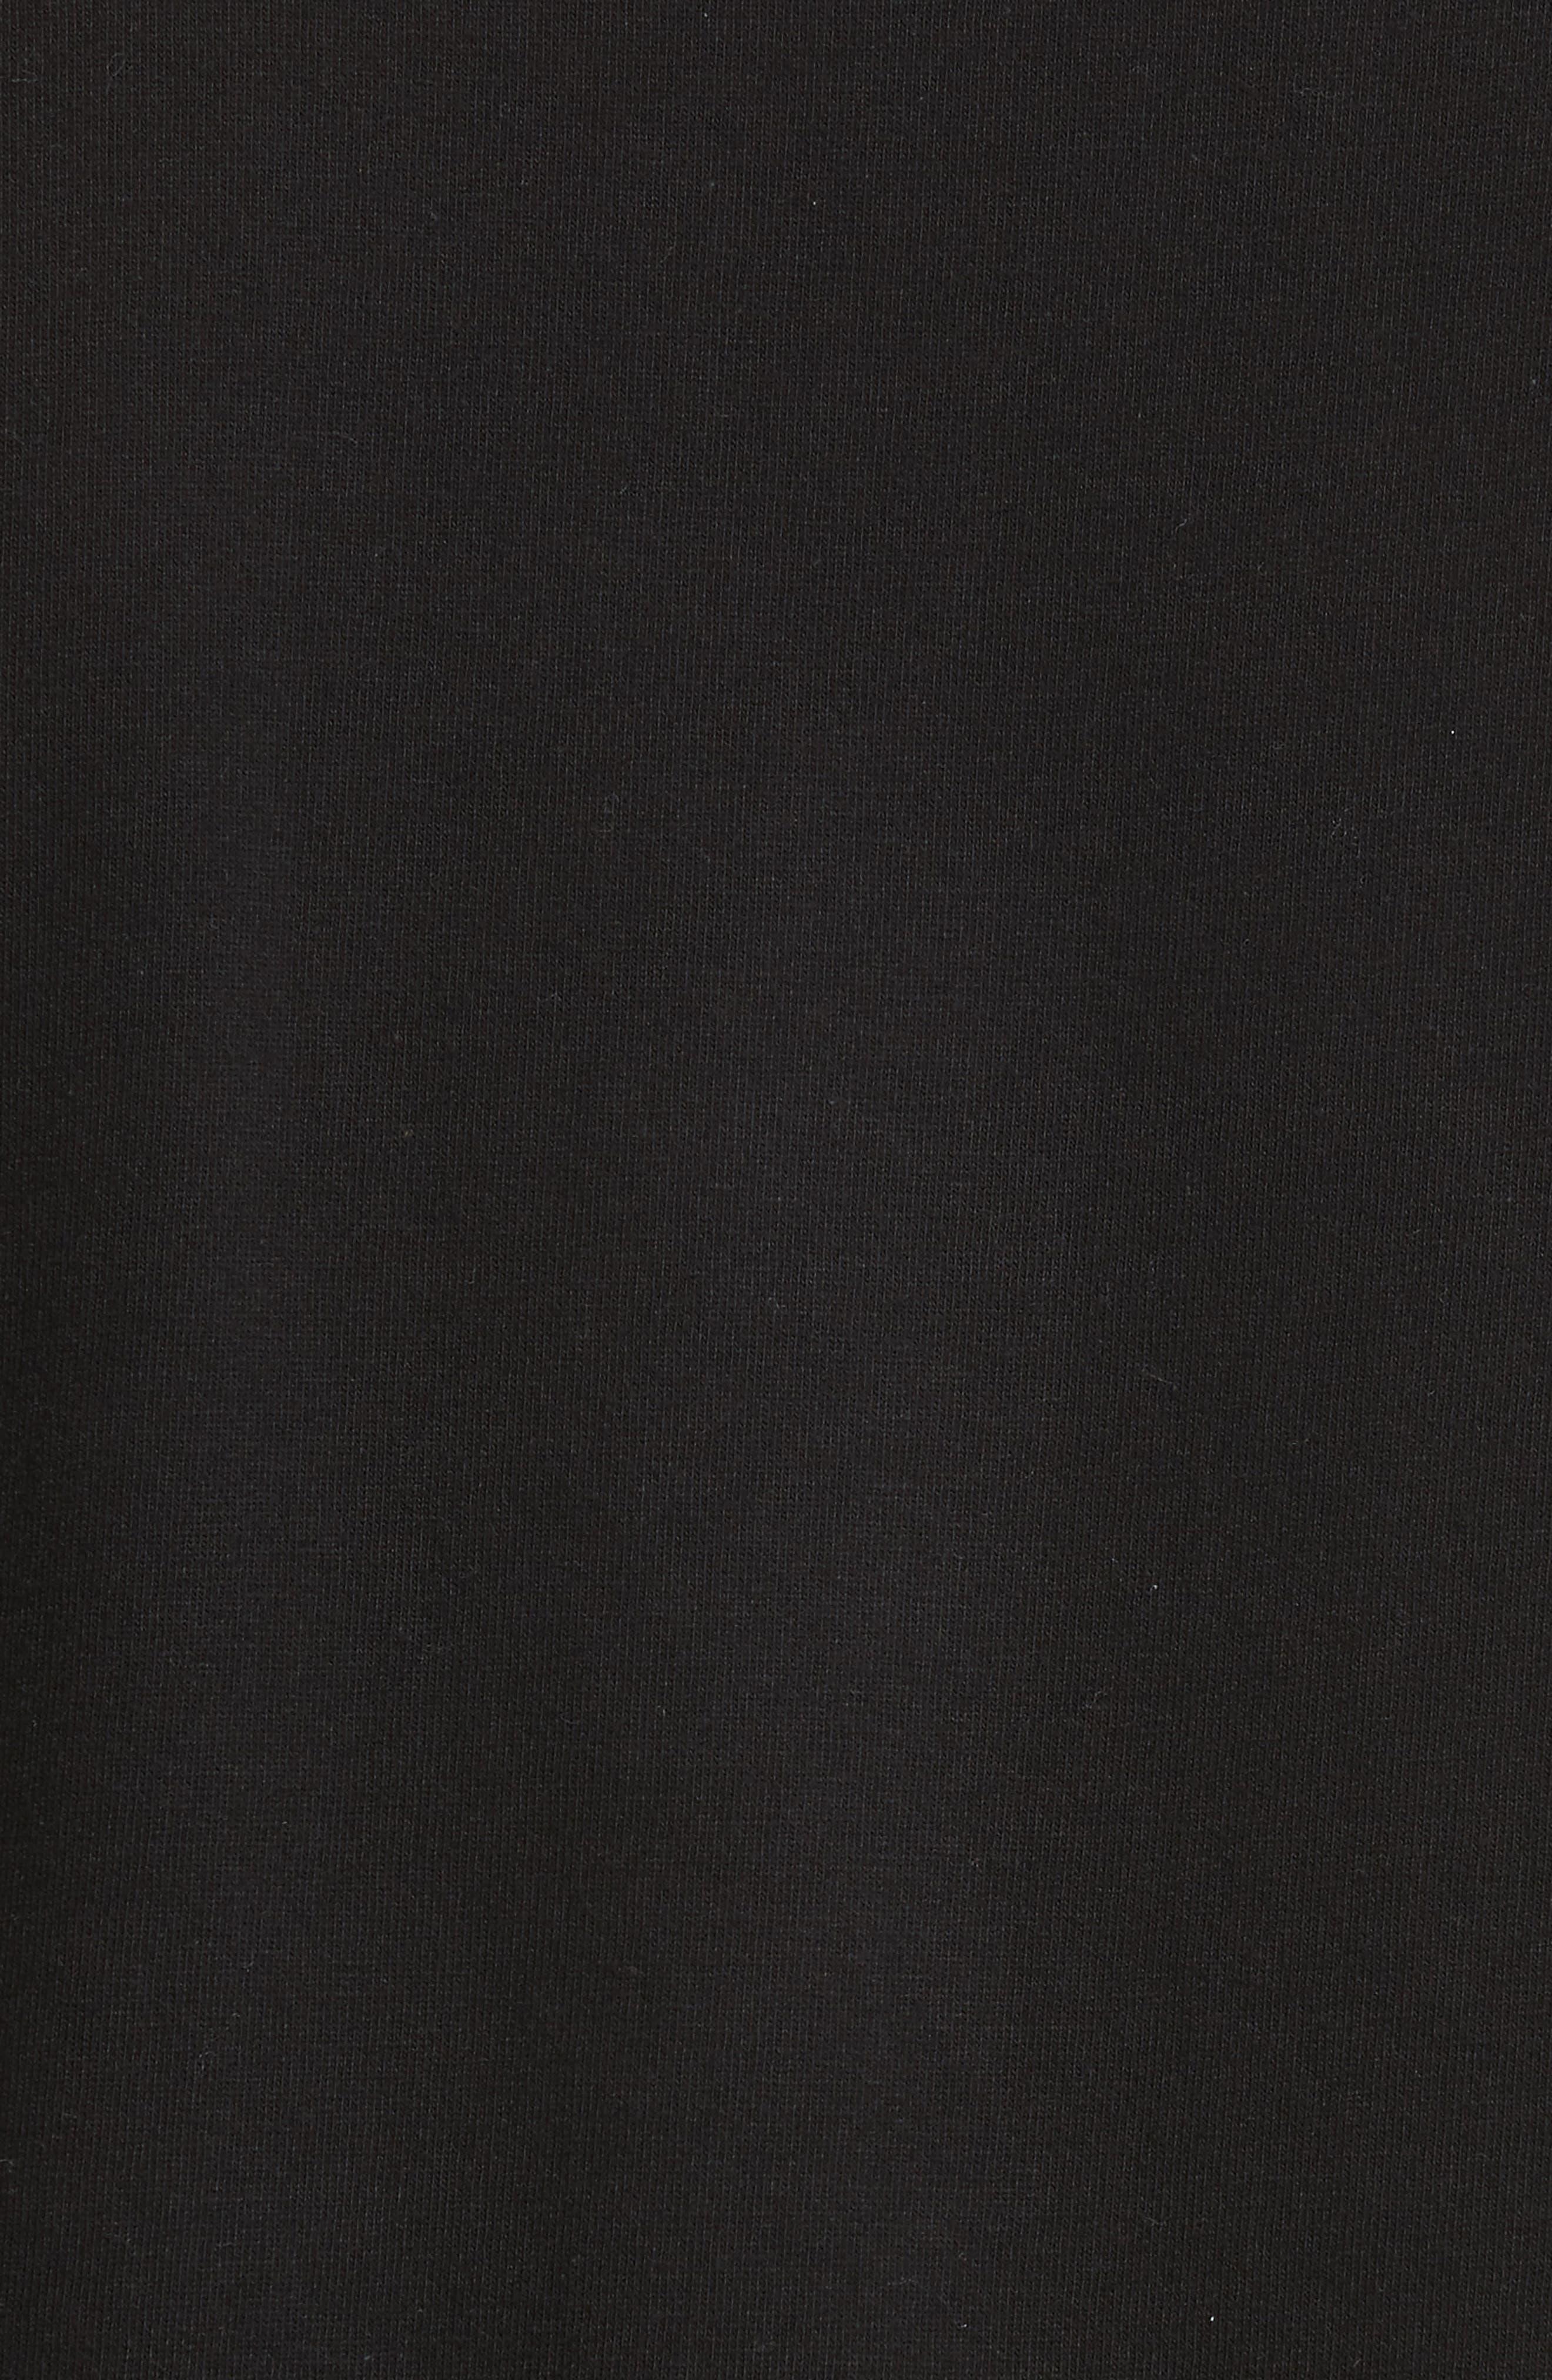 COMME DES GARÇONS PLAY, X-Ray Heart Logo T-Shirt, Alternate thumbnail 5, color, BLACK 1